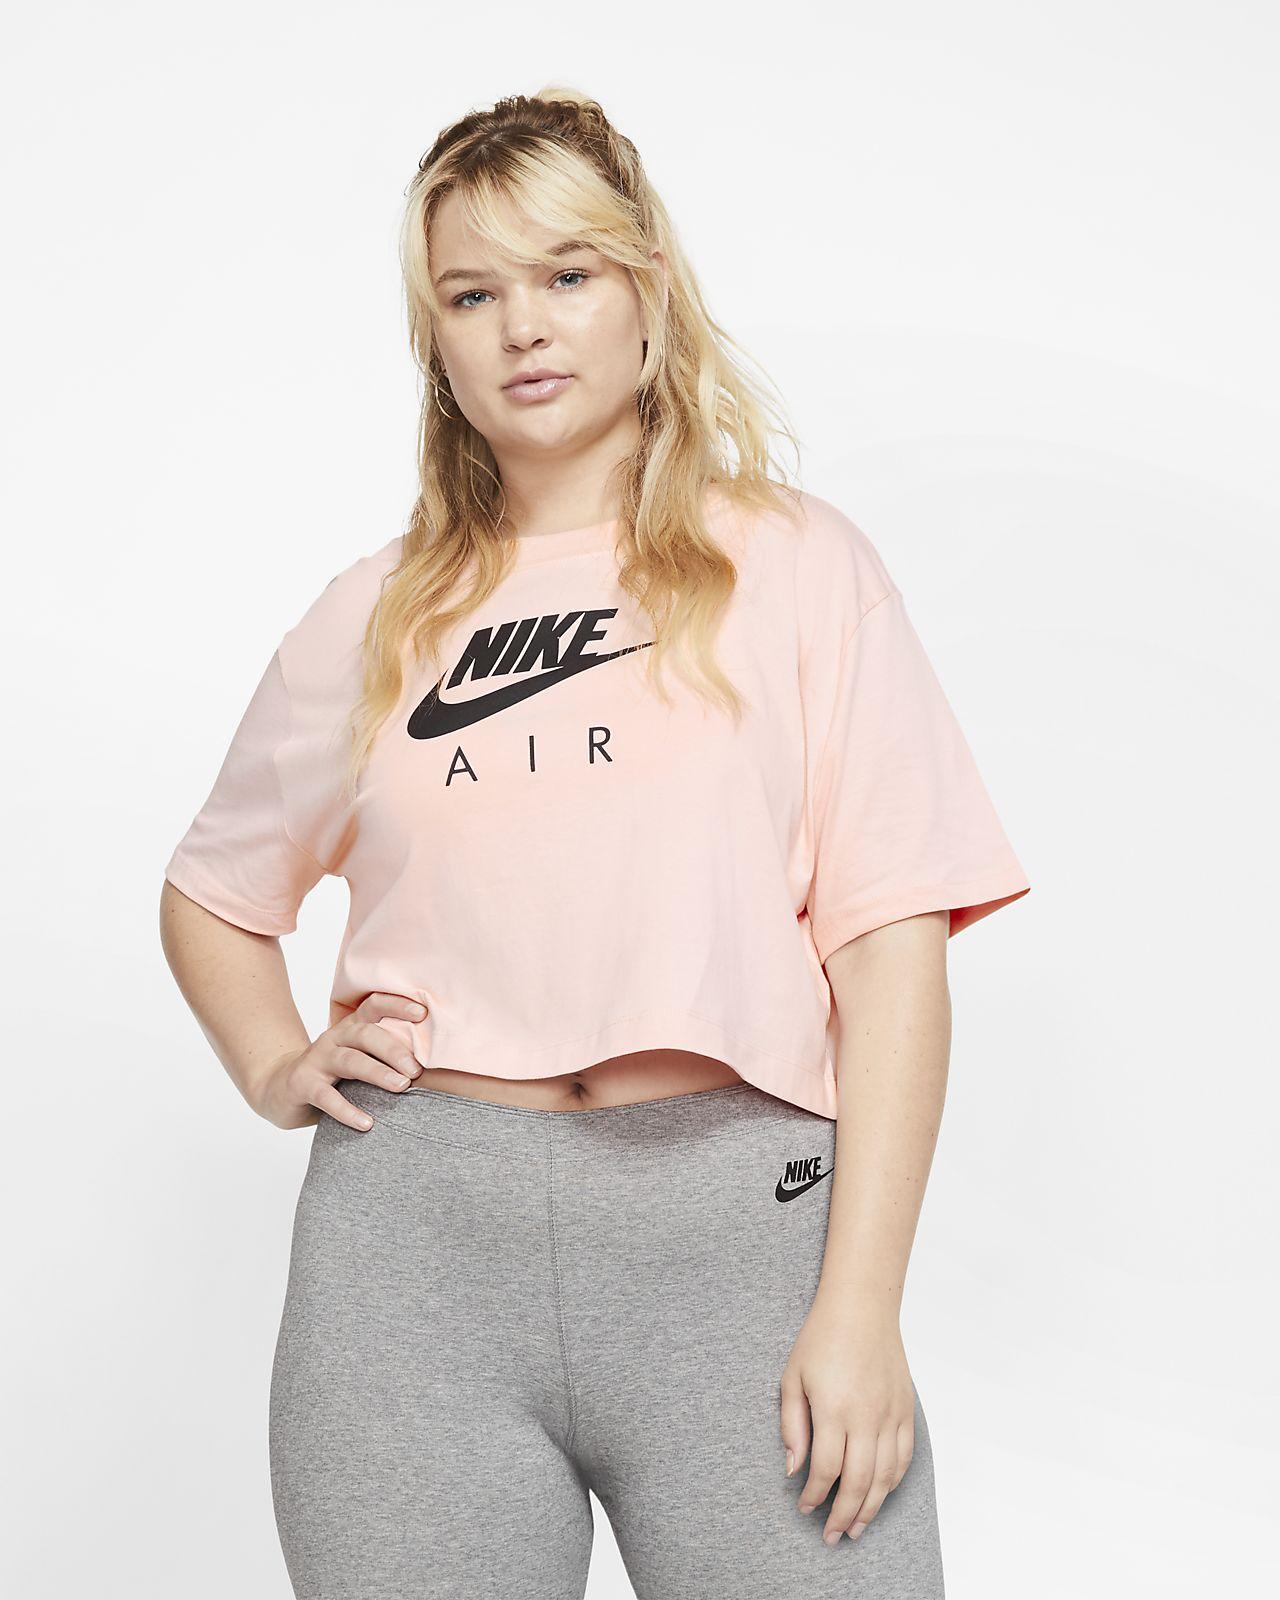 Nike Air Damestop met korte mouwen (grote maten)